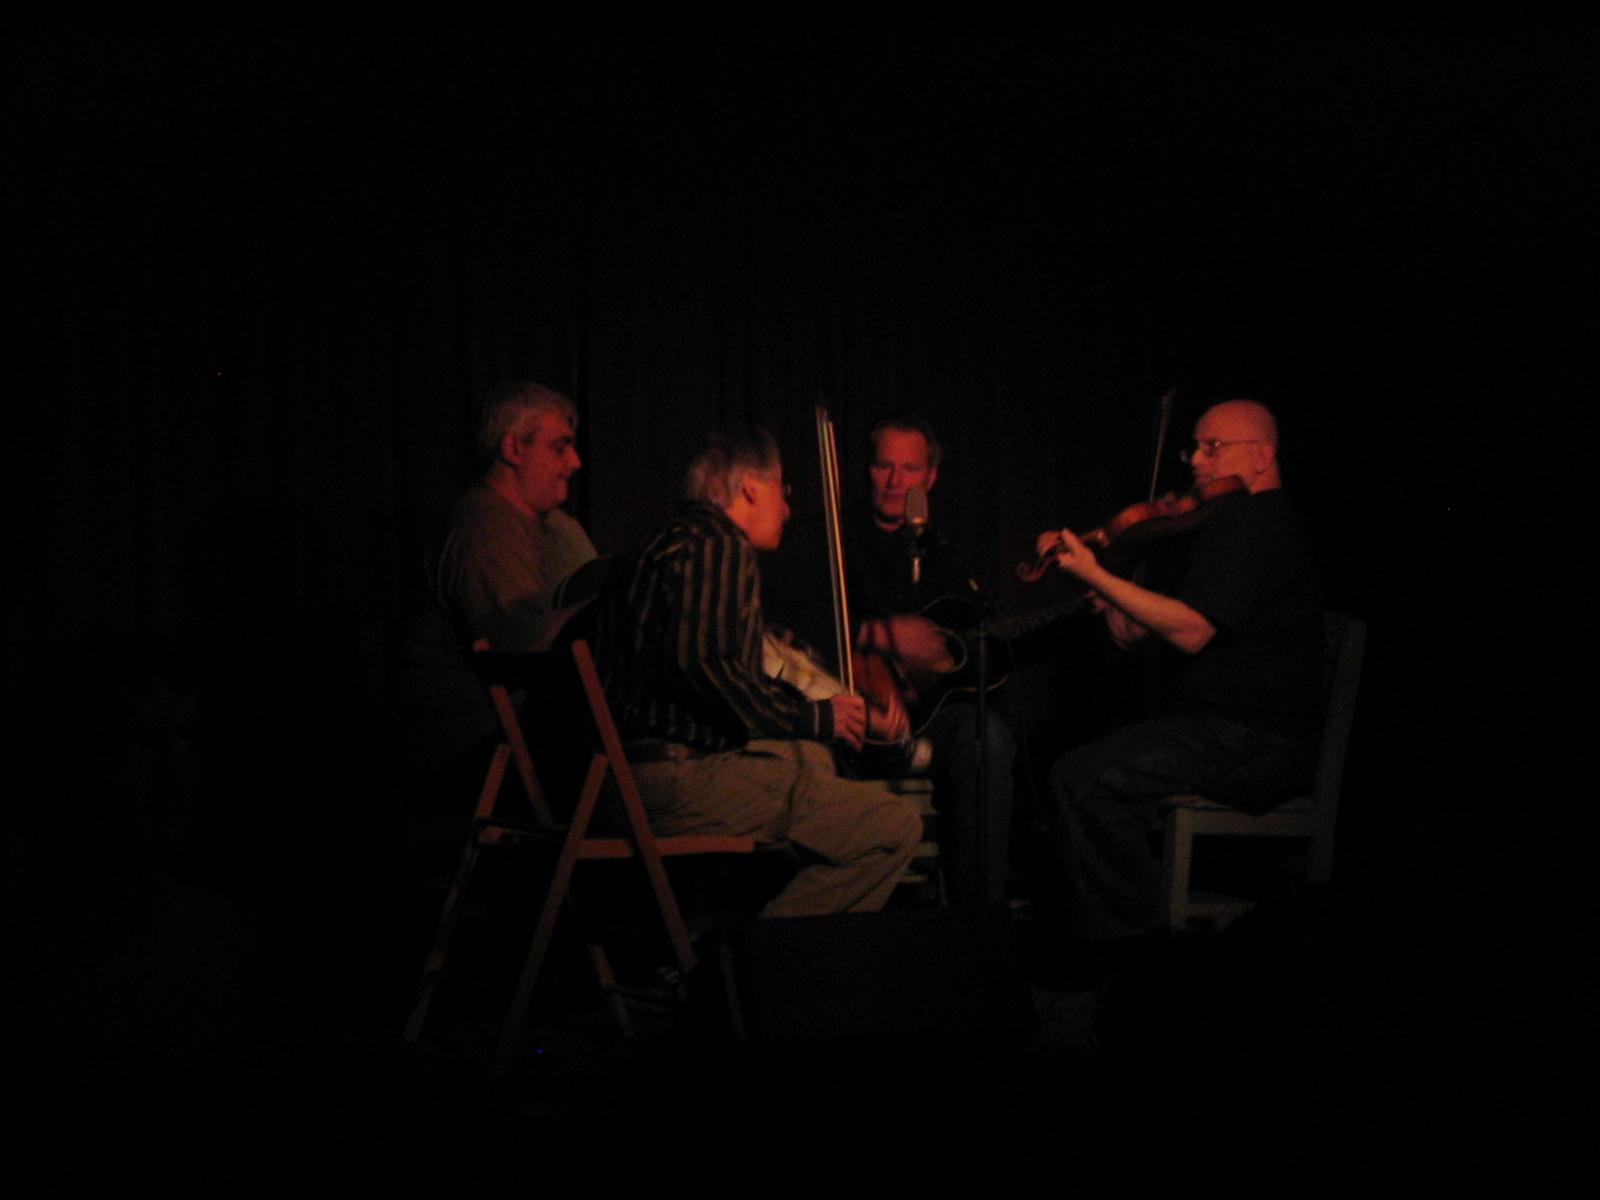 Peter Stampfel, Sam Shepard, Pat Conte, Citizen Kafka at Roots 'n' Ruckus Jalopy Feb 20 2008